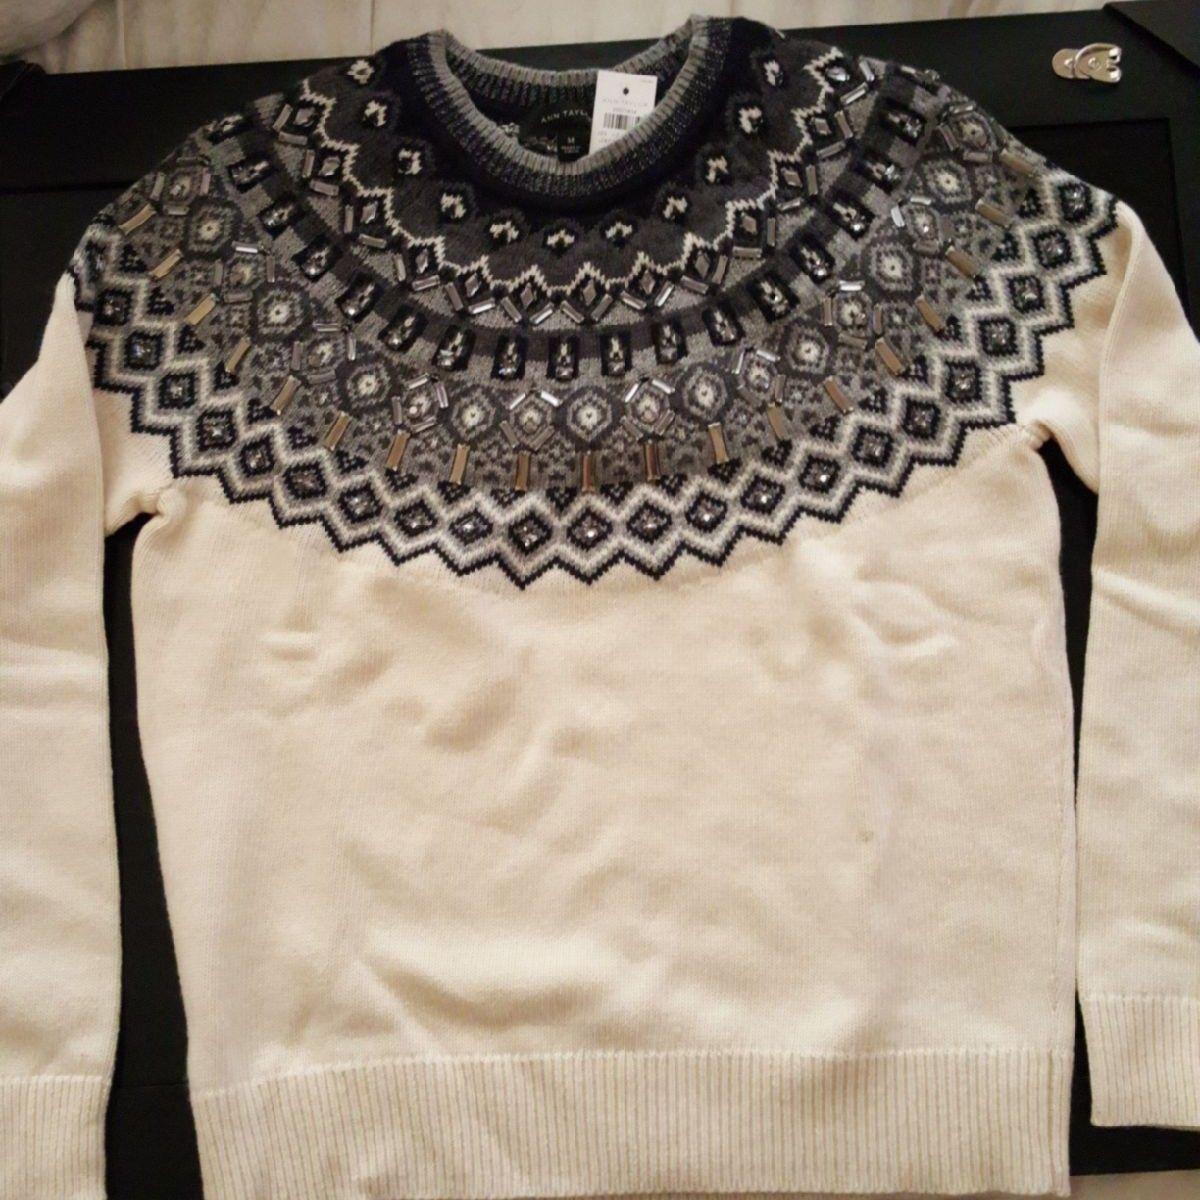 Ann Taylor Fair Isle sweater w/ embell. - Mercari: BUY & SELL ...